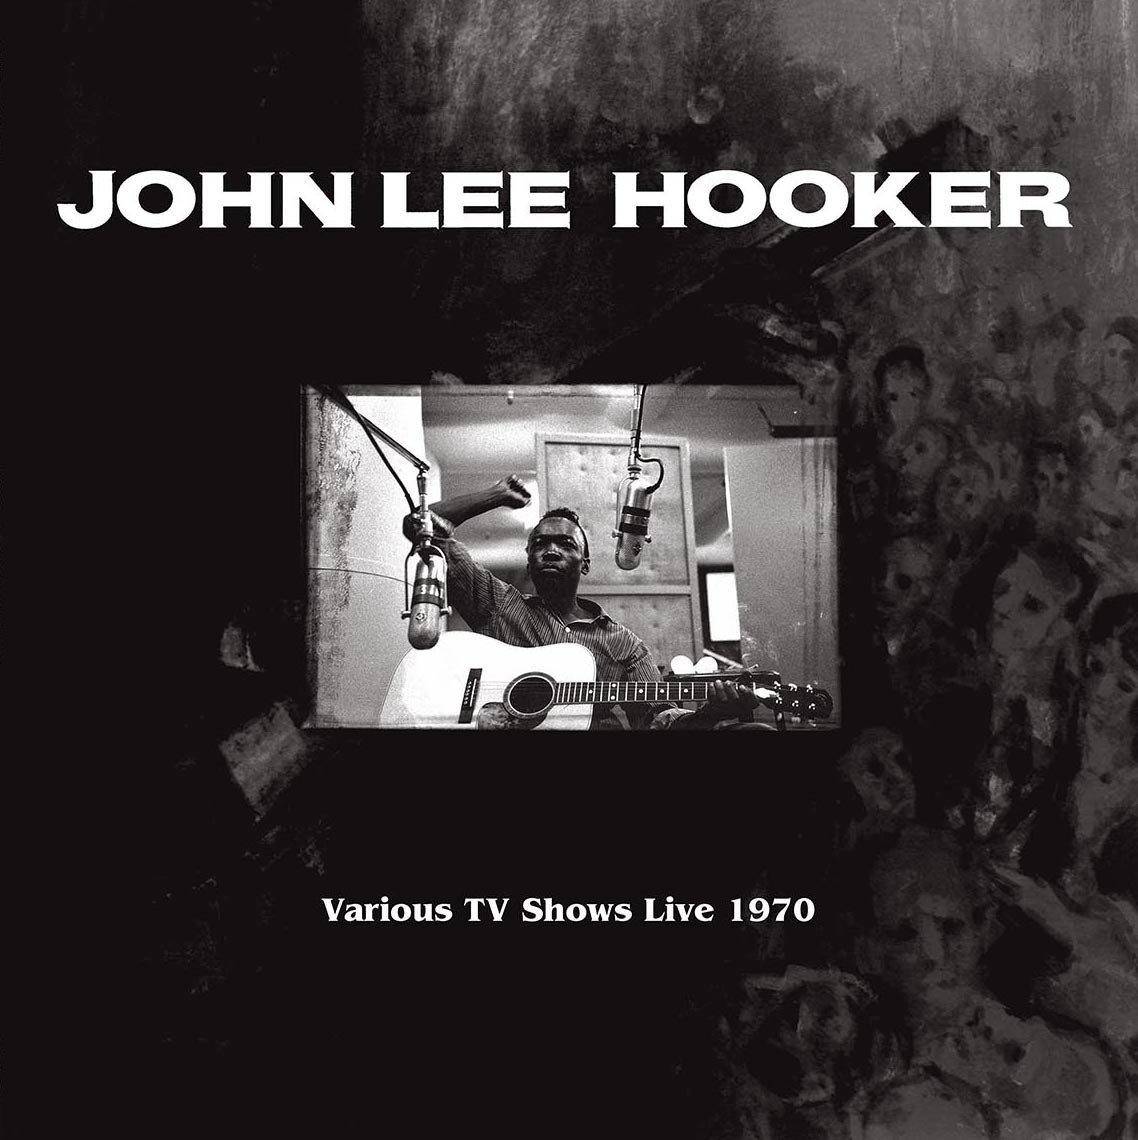 Various Tv Shows Live 1970 Feat. The Doors In Road - Vinyl